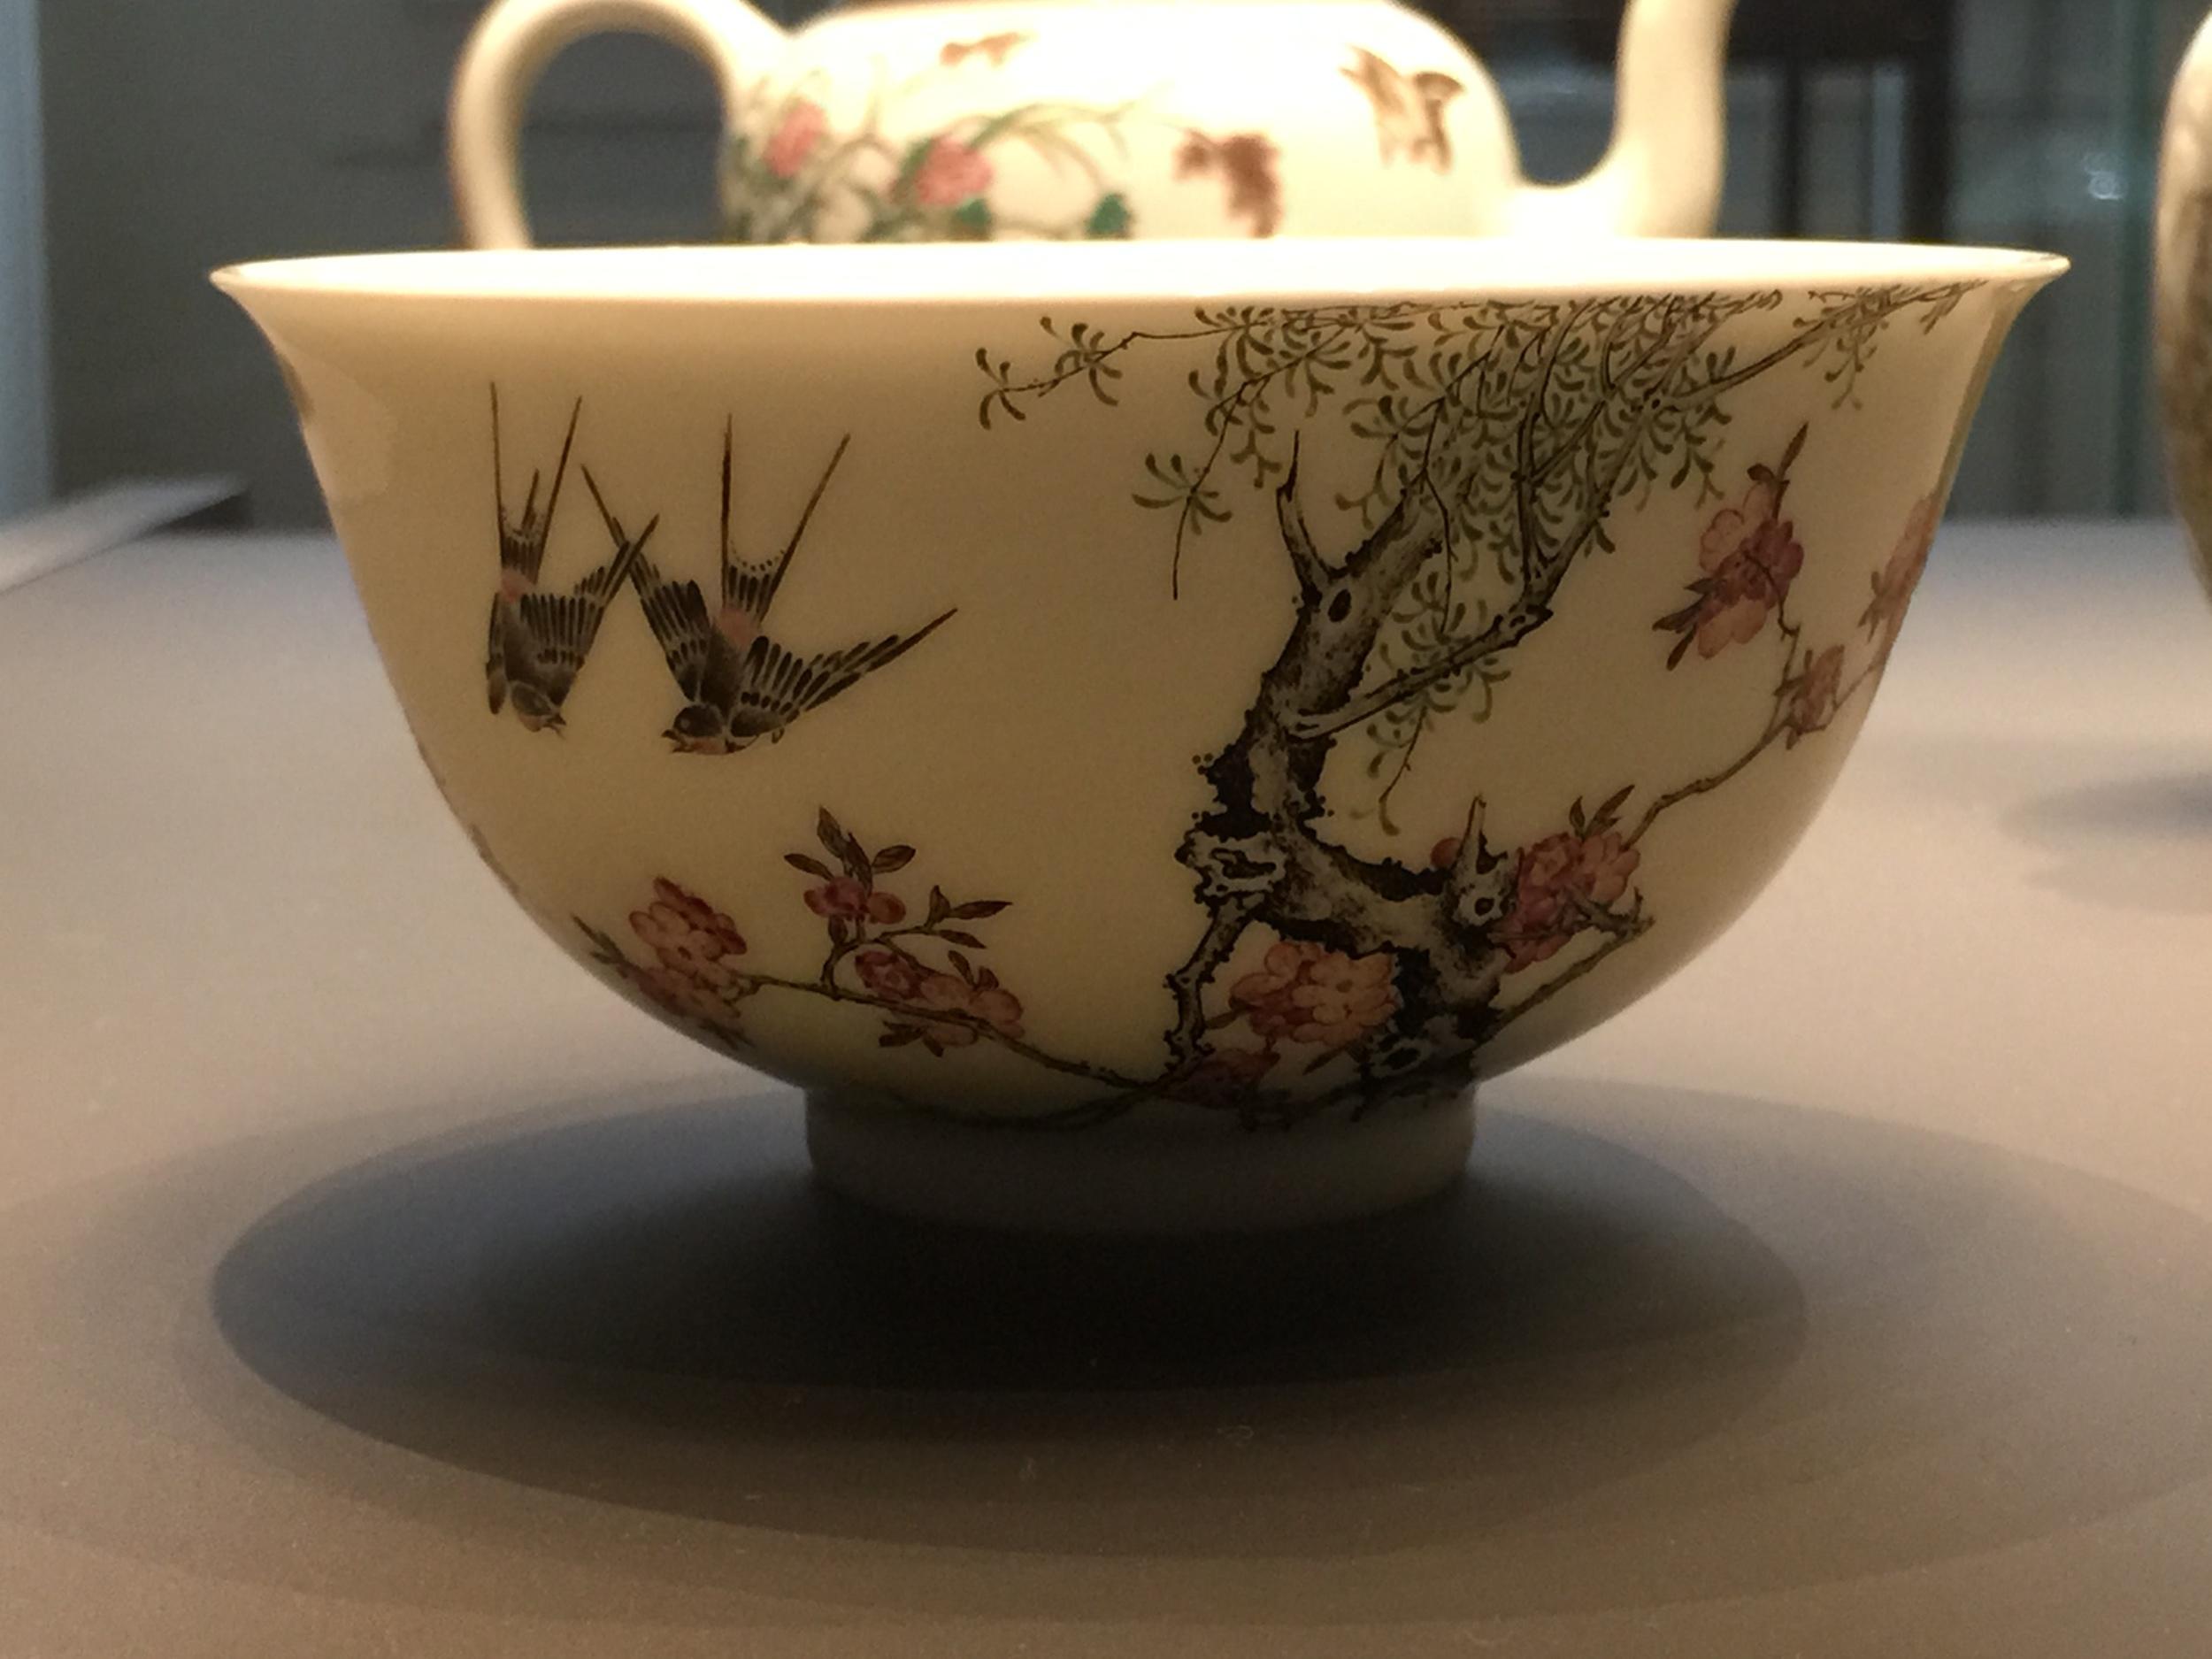 Chinese-Porcelain-British-Museum-Percival-David-jessewaugh.com-92.jpg